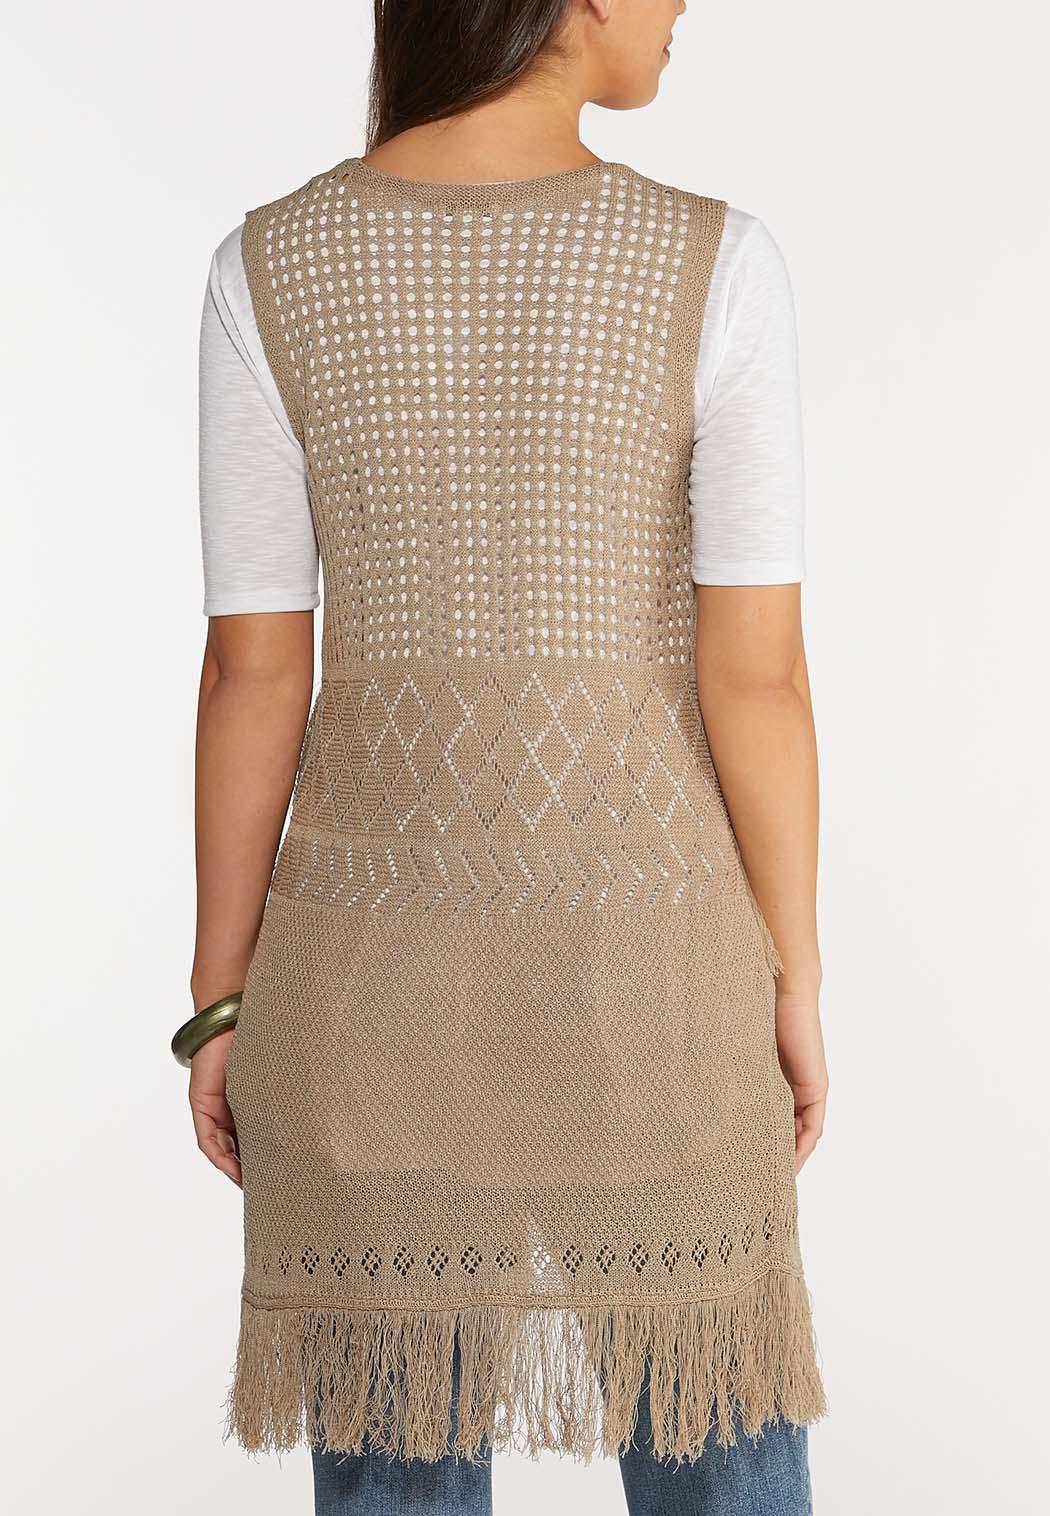 Plus Size Fringe Crochet Vest (Item #43961598)